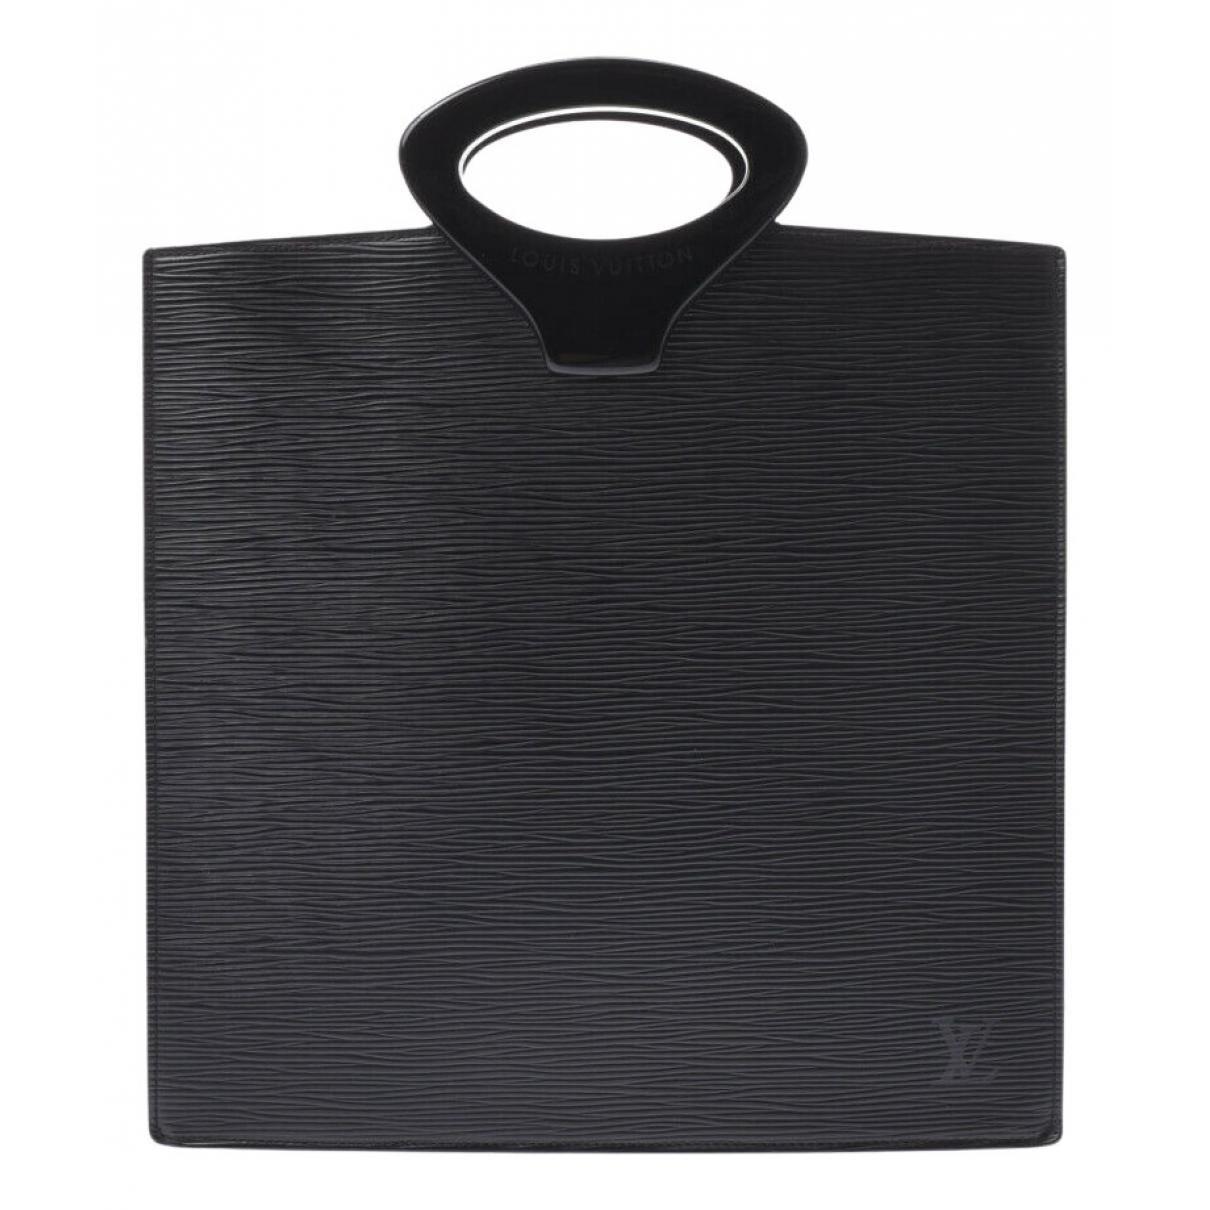 Louis Vuitton Ombre  Handtasche in  Schwarz Leder